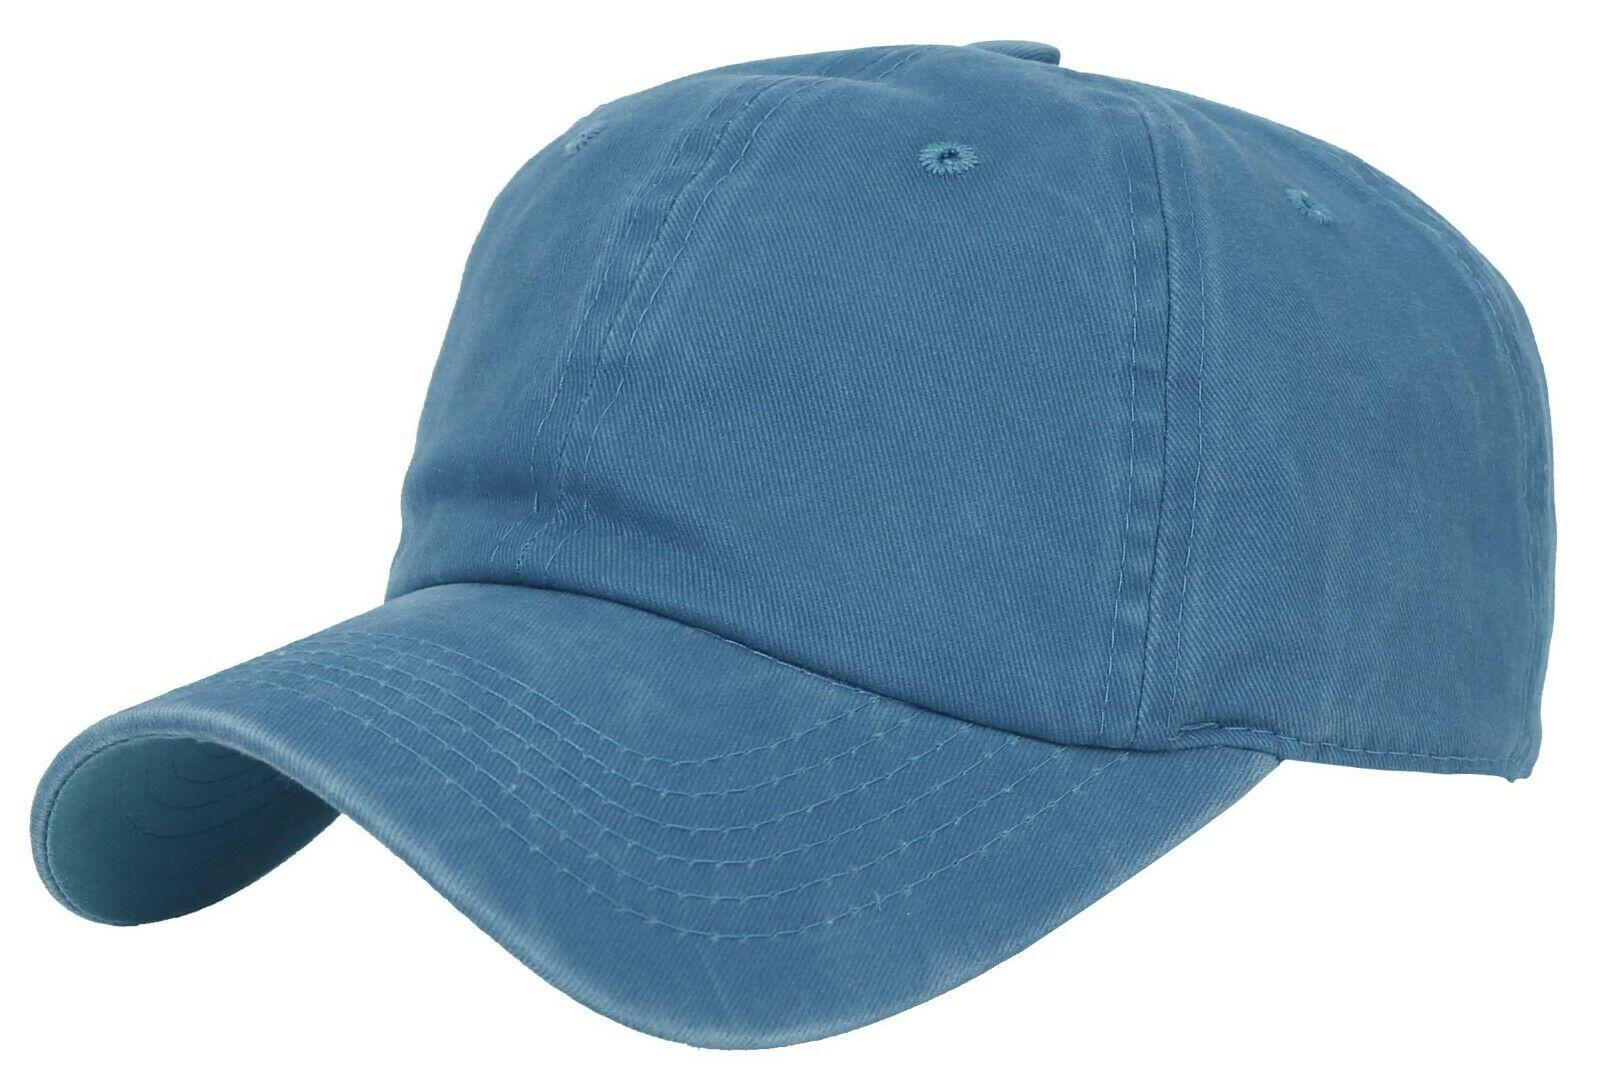 BASEBALL-CAP-Plain-Dad-Hat-Low-Profile-Vintage-Washed-Pigment-Adjustable thumbnail 20